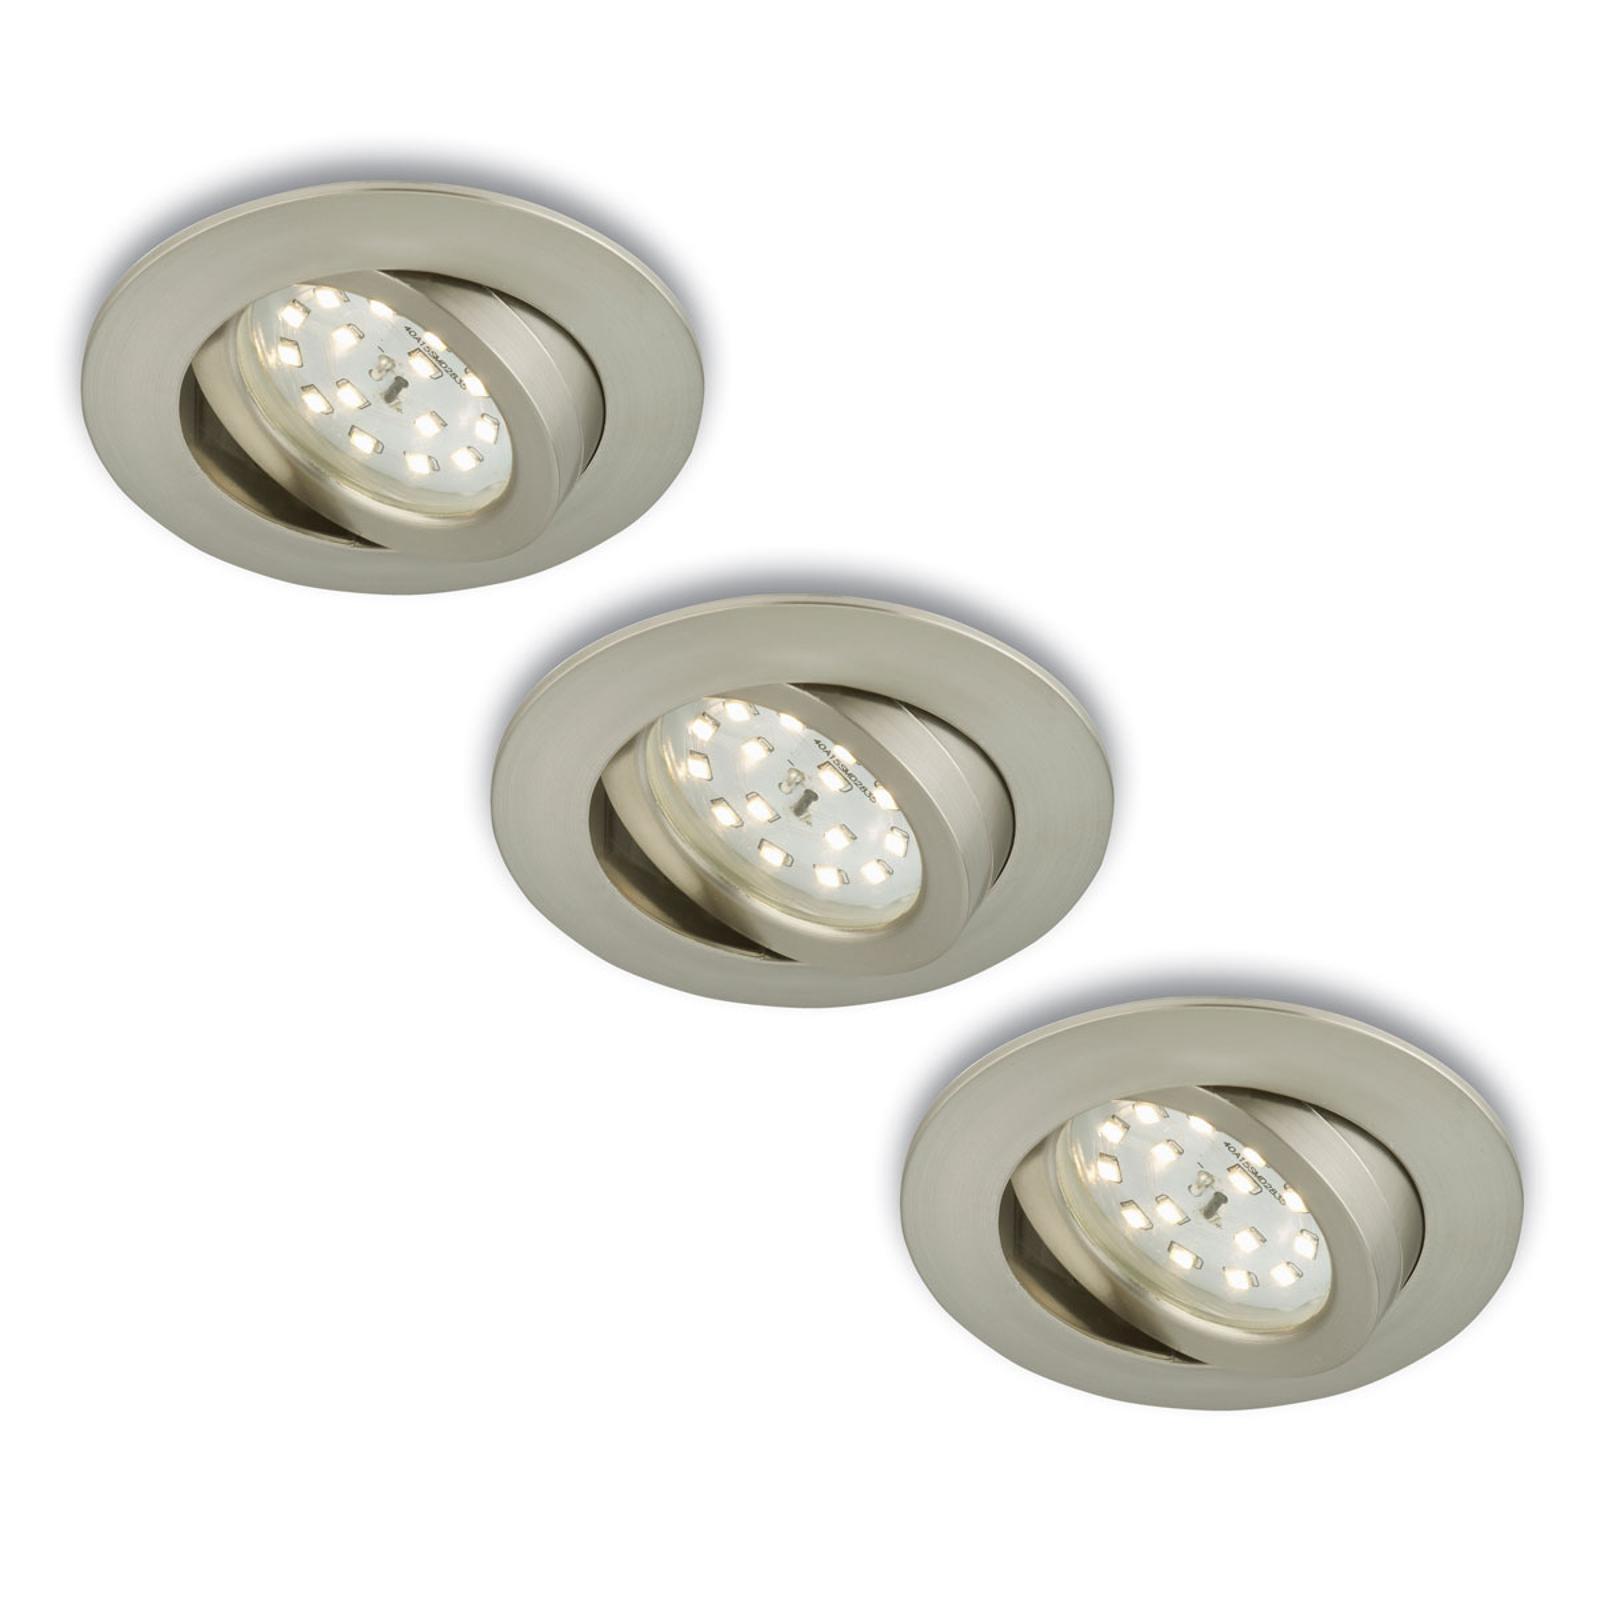 Foco LED empotrable girat., 3 unid., mate-níquel